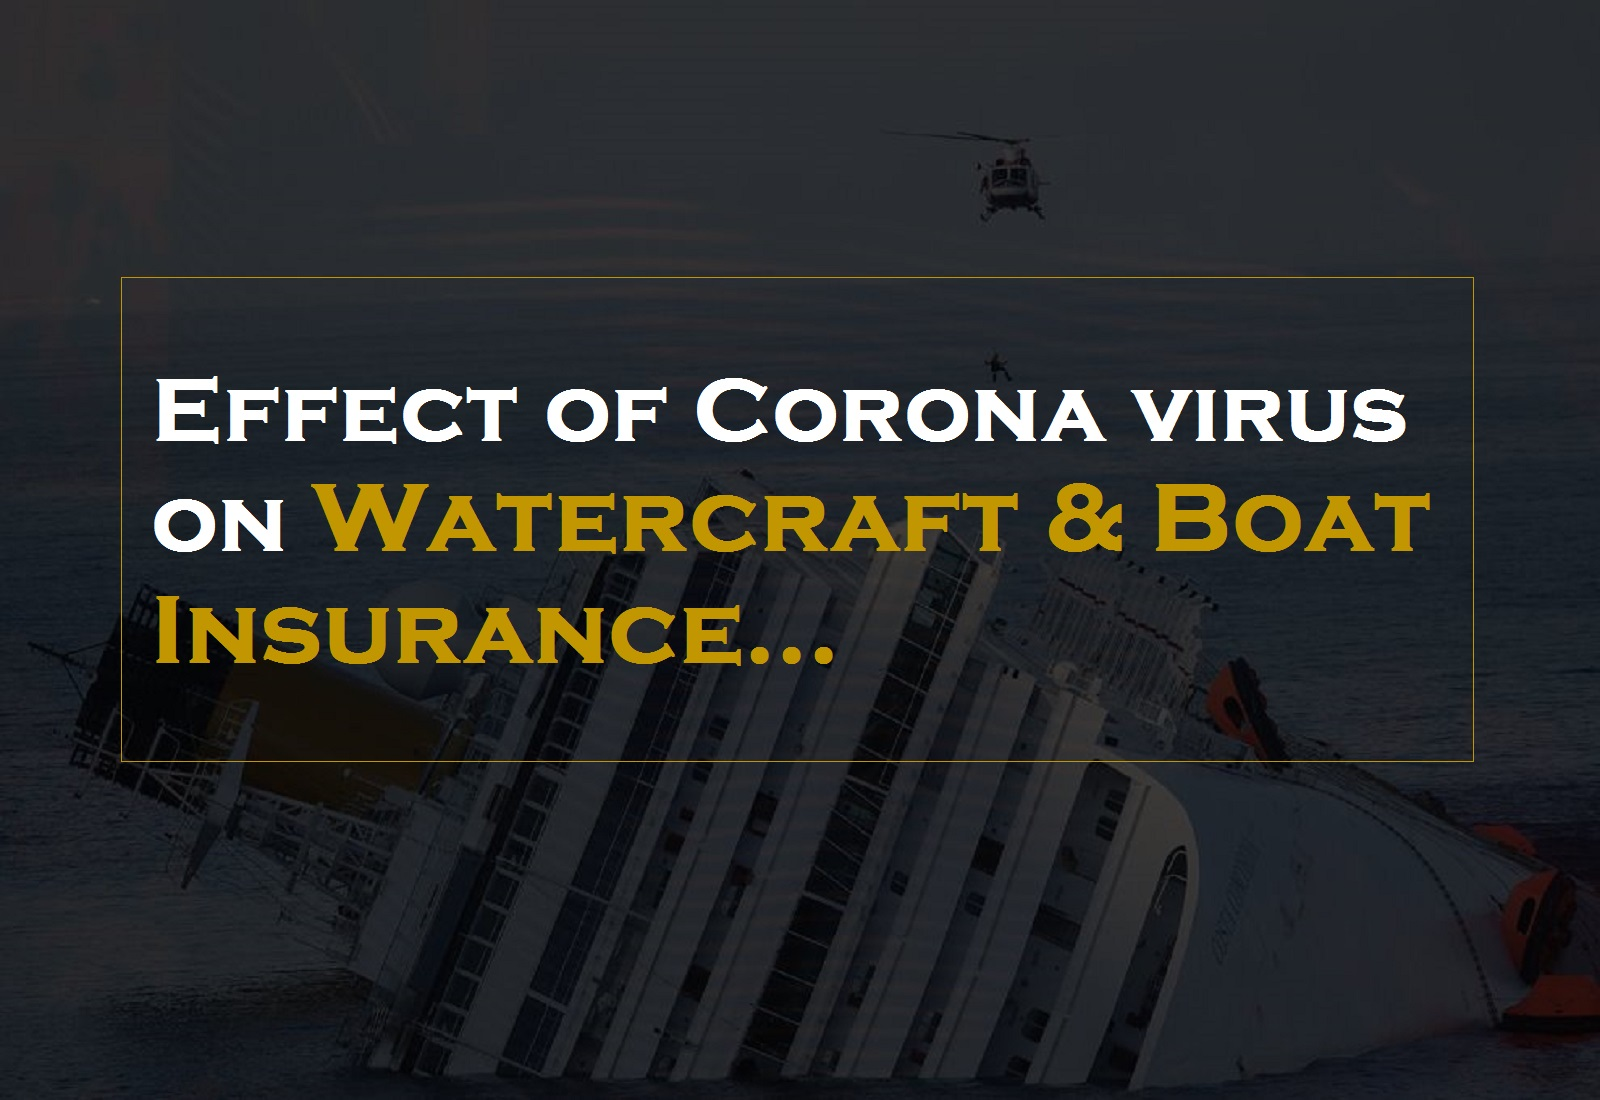 Effect of Corona virus on Watercraft and Boat Insurance